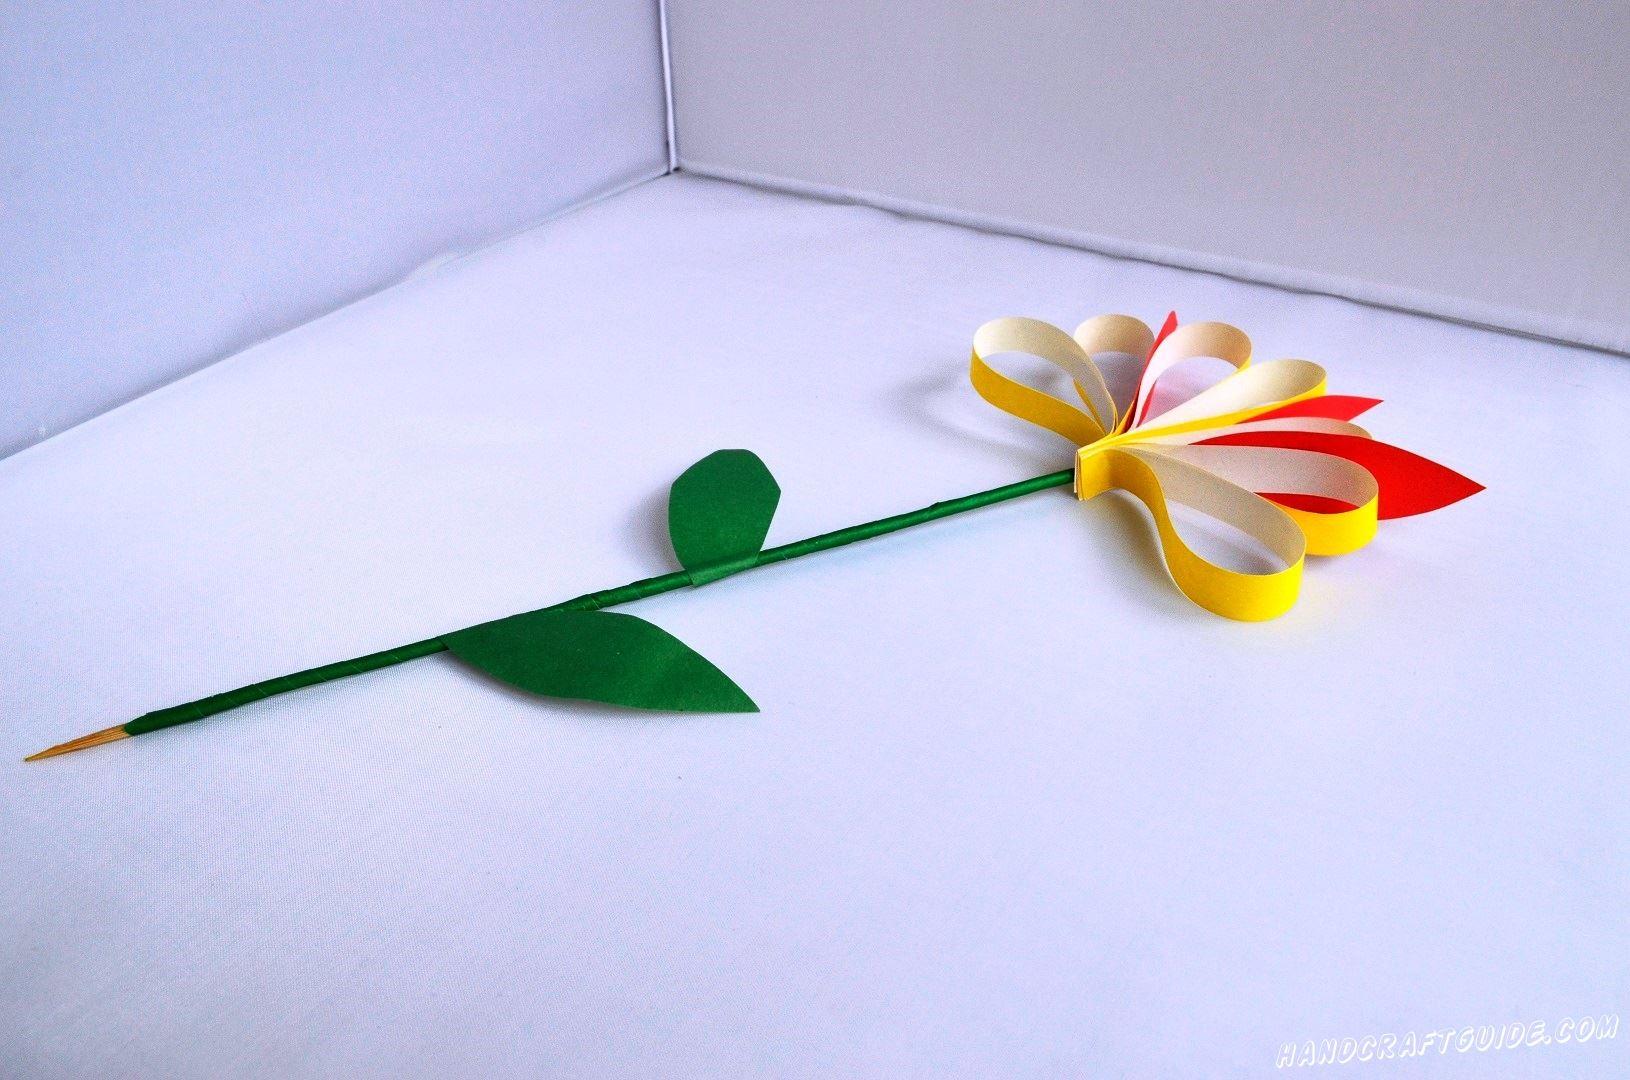 Приклеиваем желтый цветочек на шпажку, а между лепестками приклеиваем красные лепесточки